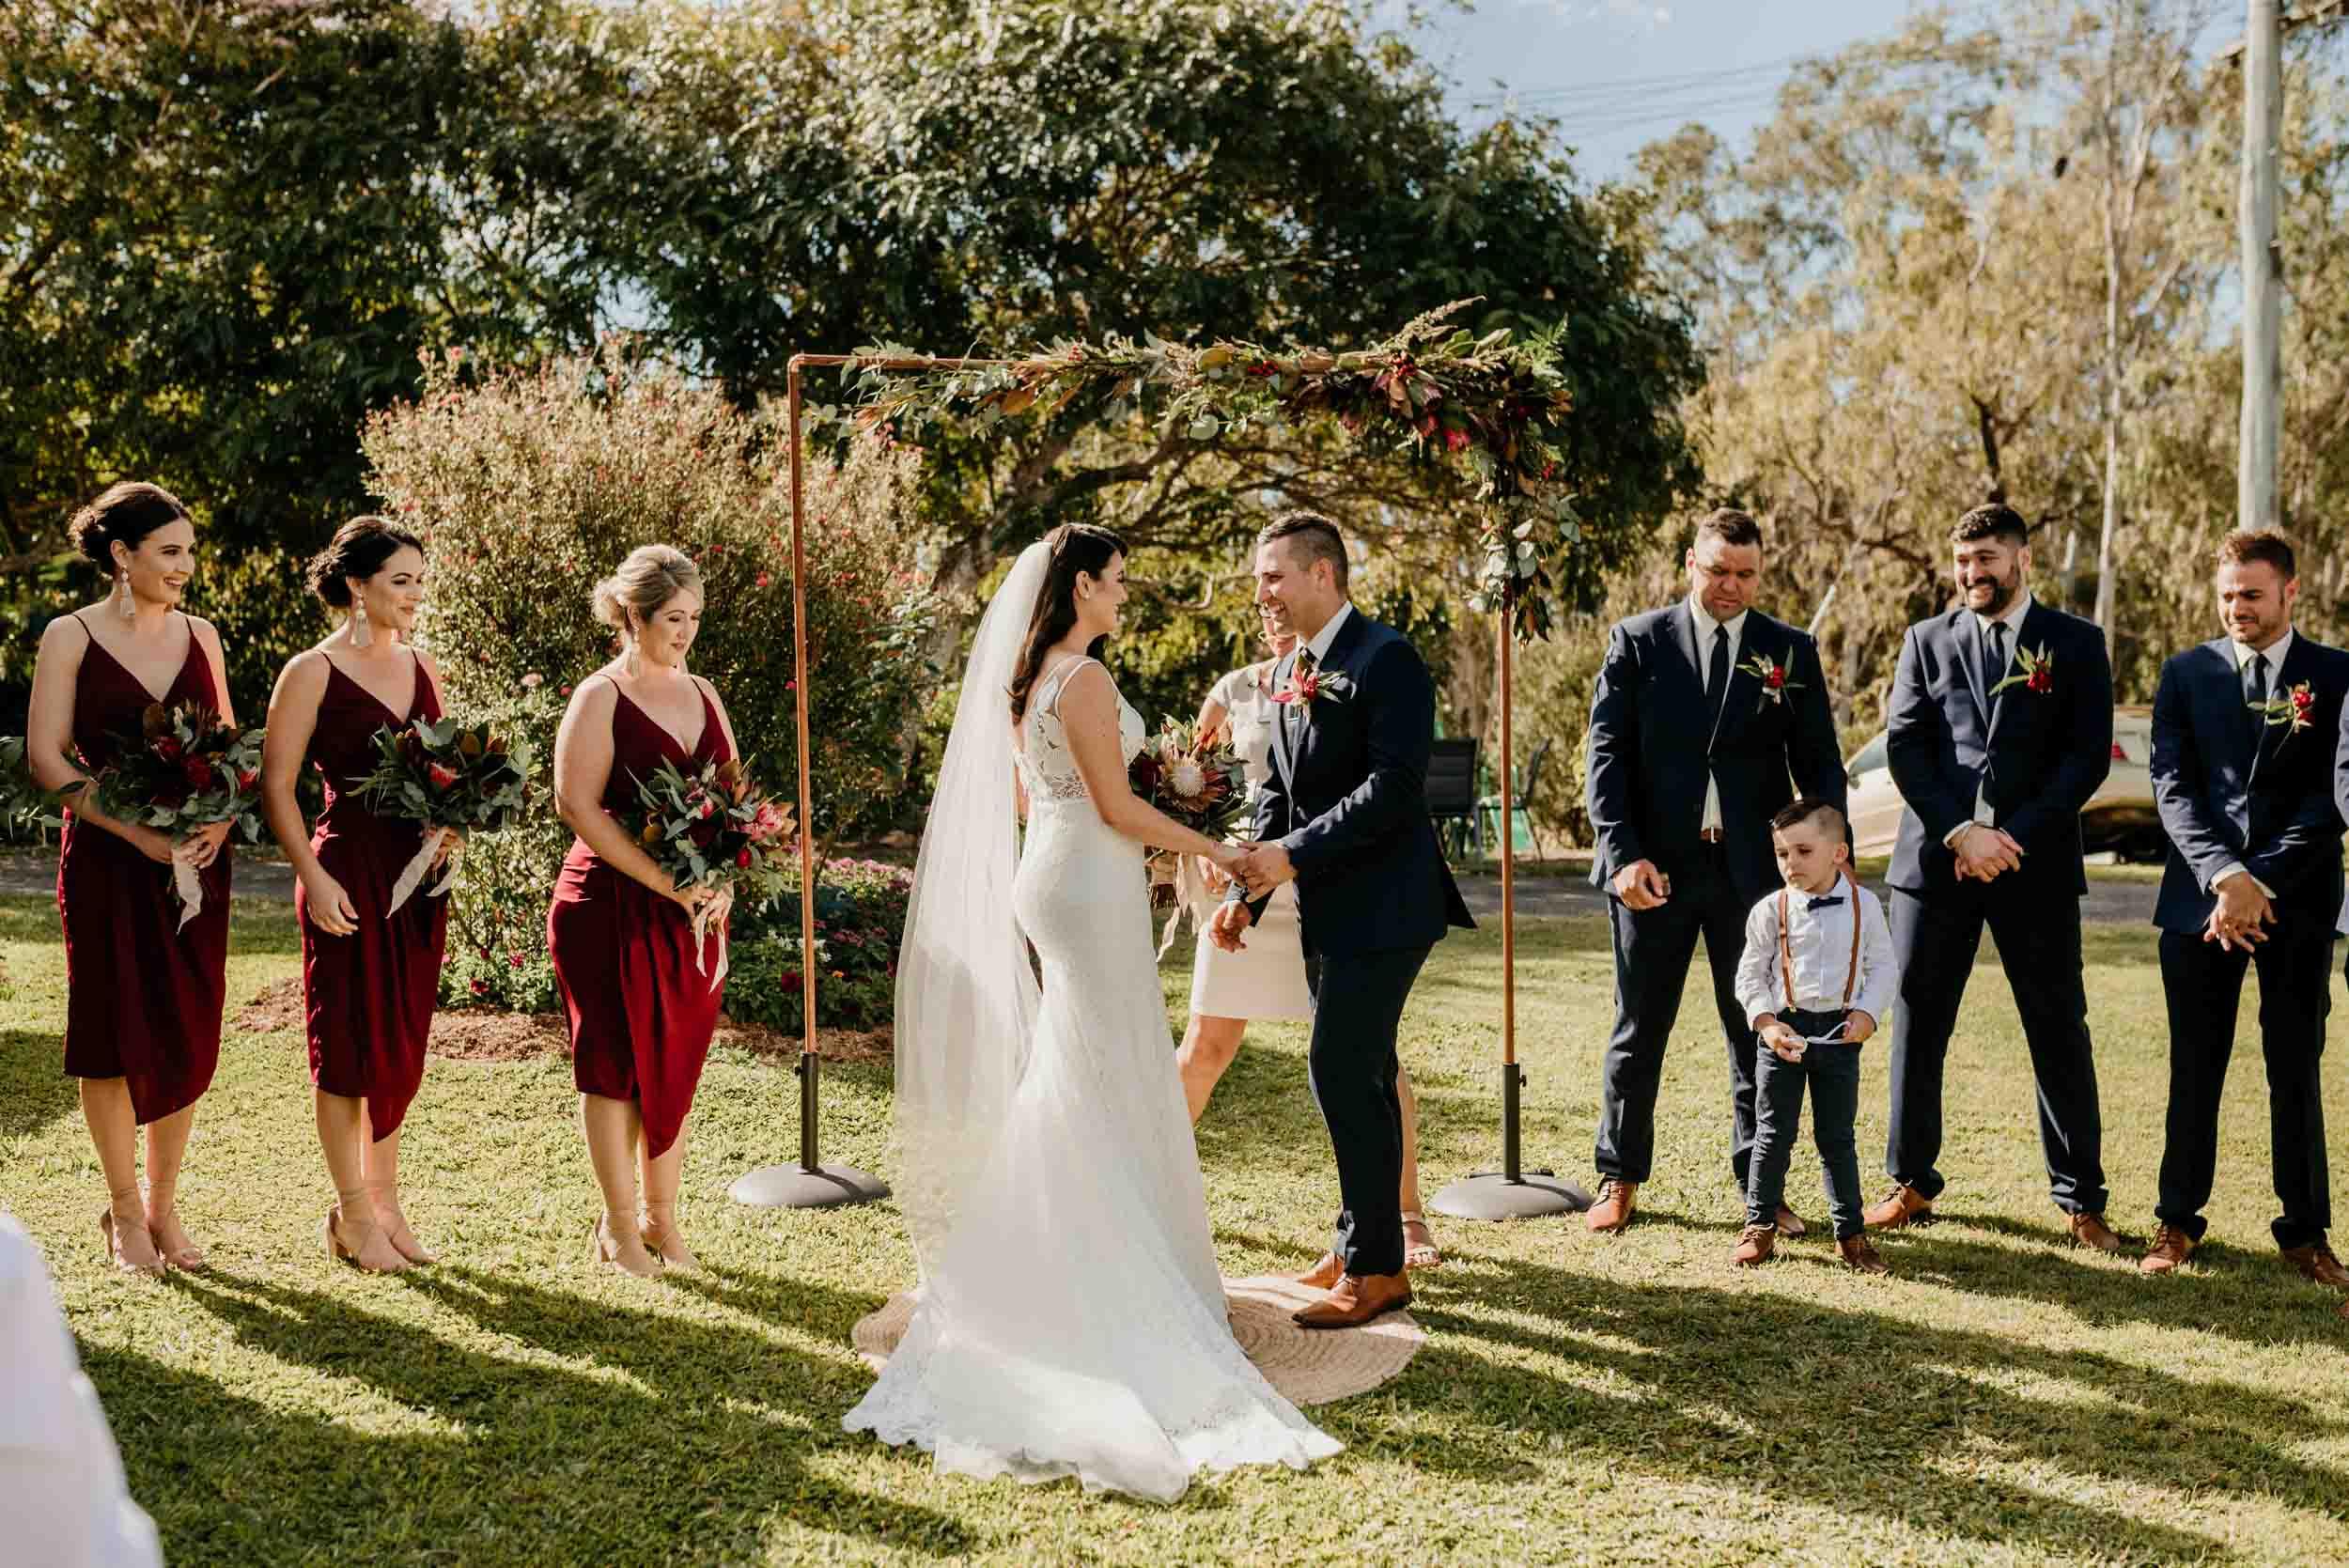 The Raw Photographer - Cairns Wedding Photographer - Atherton Tablelands - Mareeba farm Wedding - Irene Costa's Devine Bridal - Candid - Photo Package-22.jpg